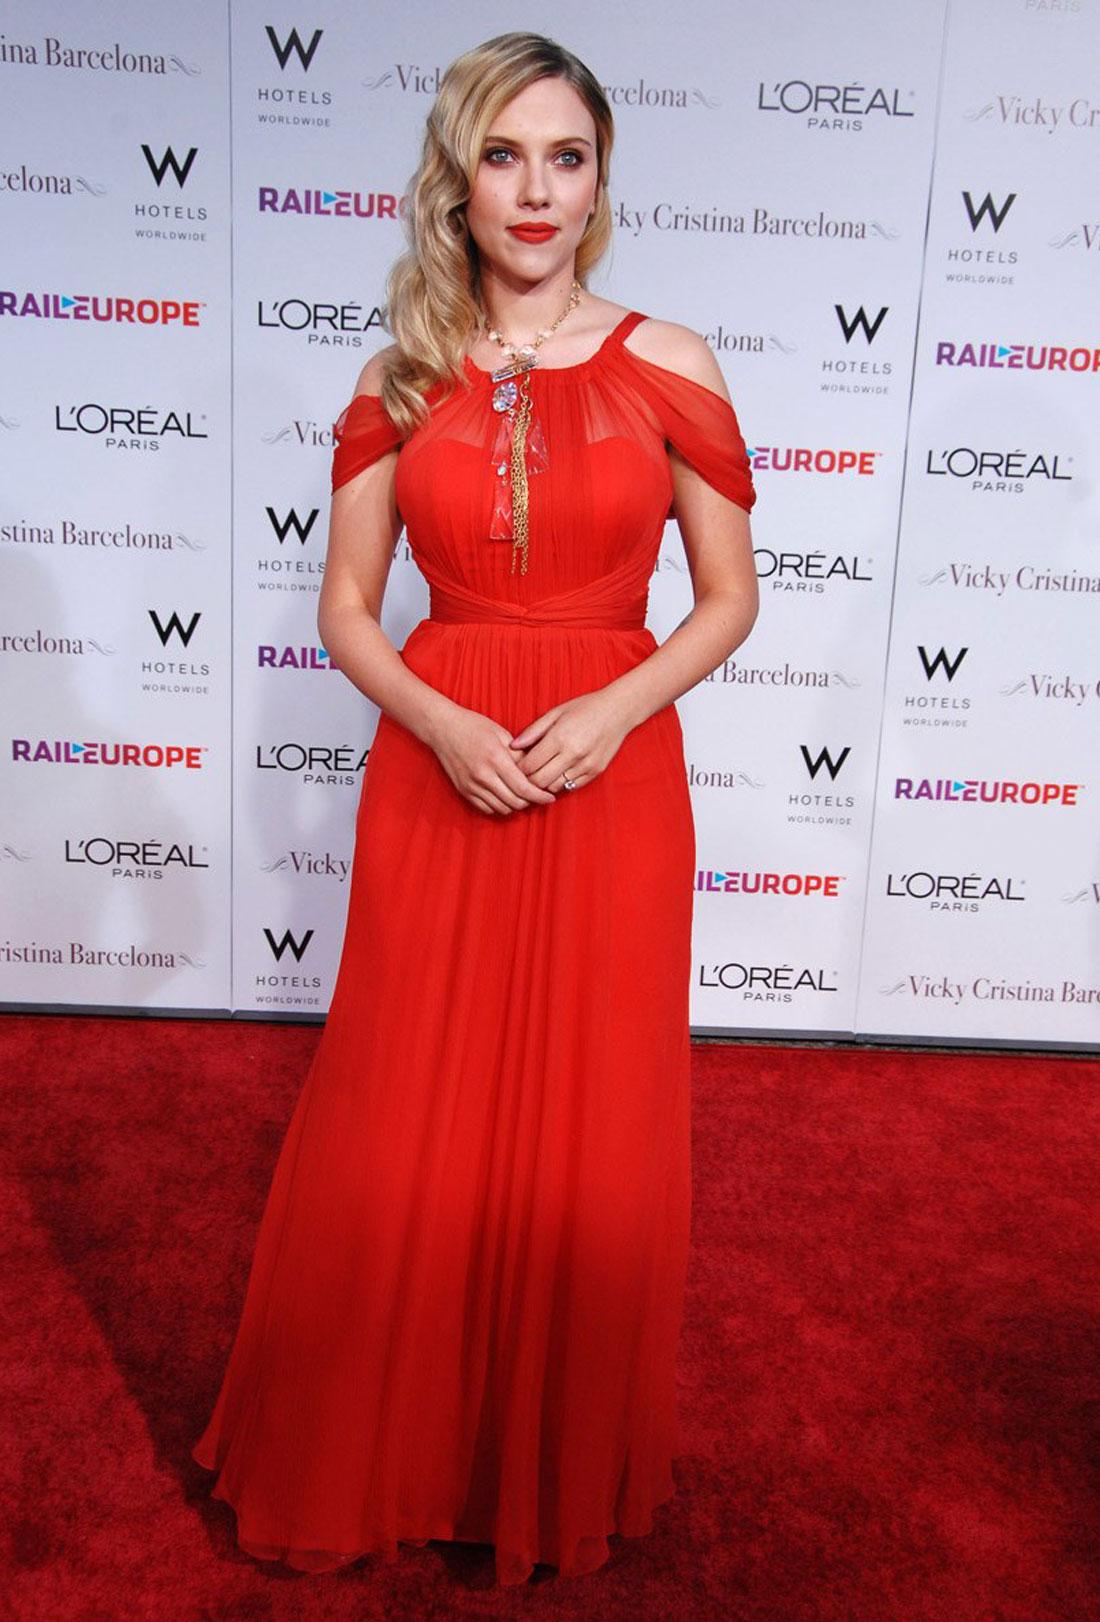 scar jo golden globes red dress